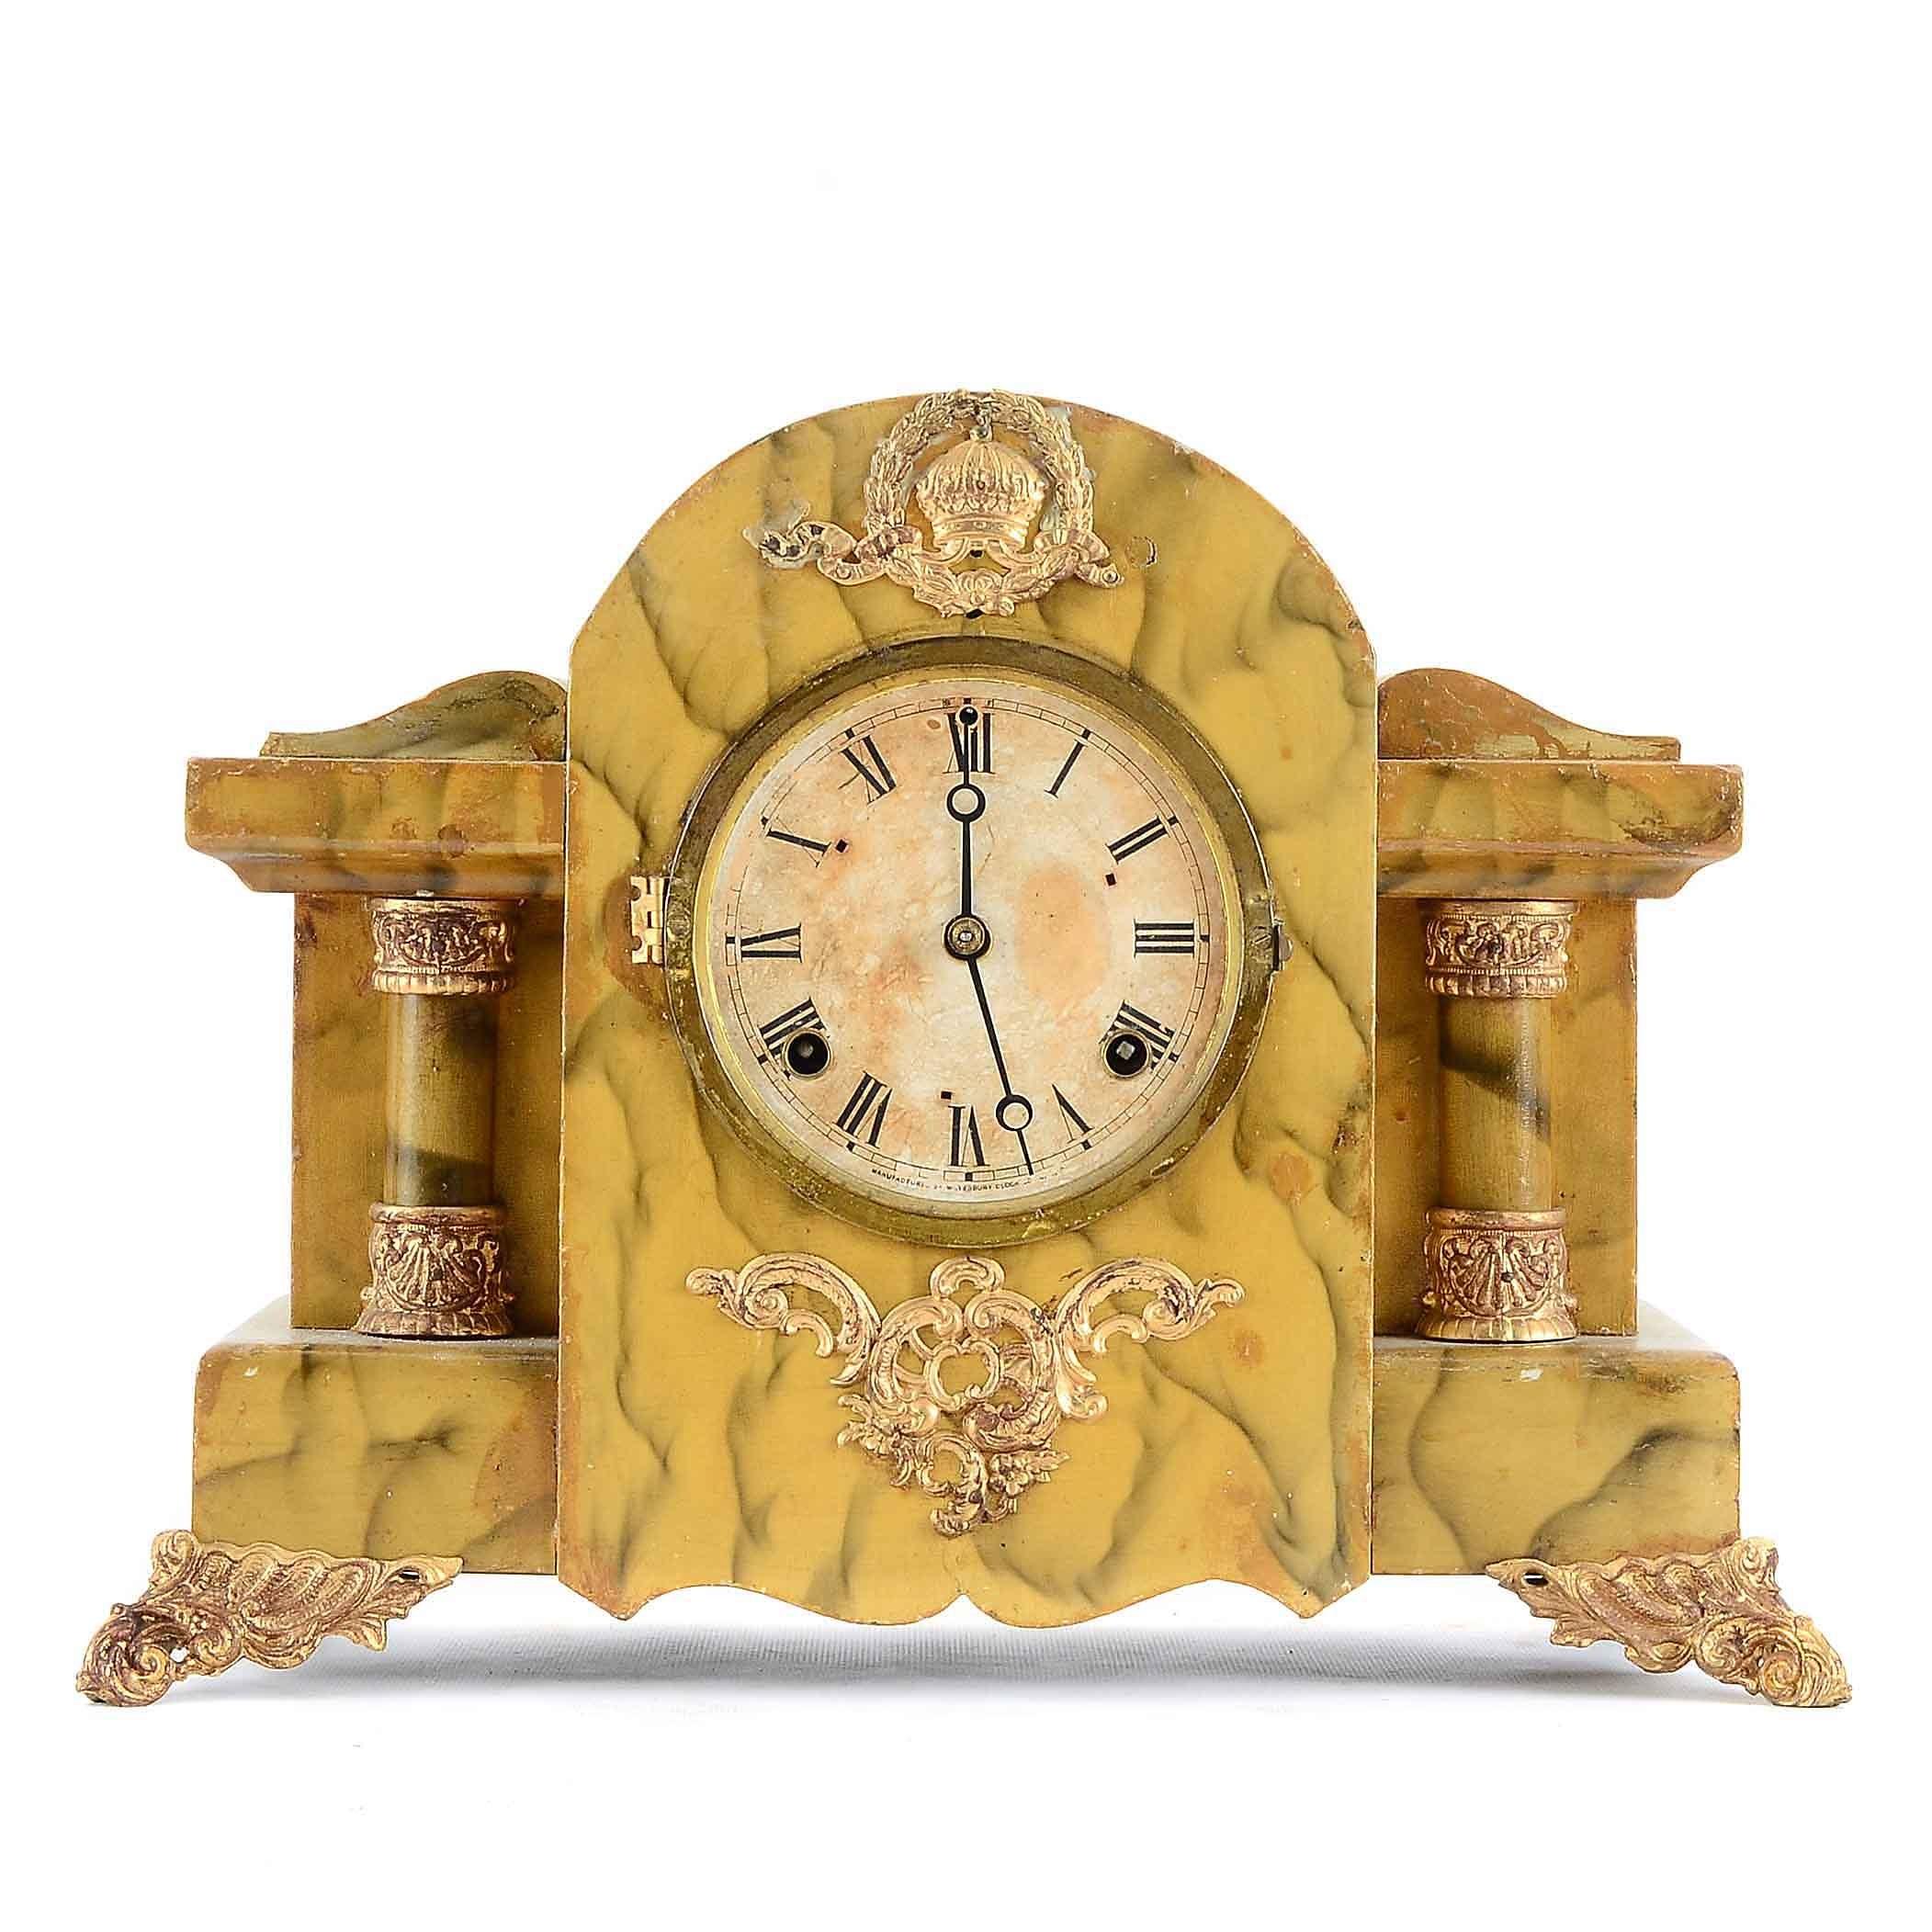 Vintage Mantel Clock with Faux Stone Case